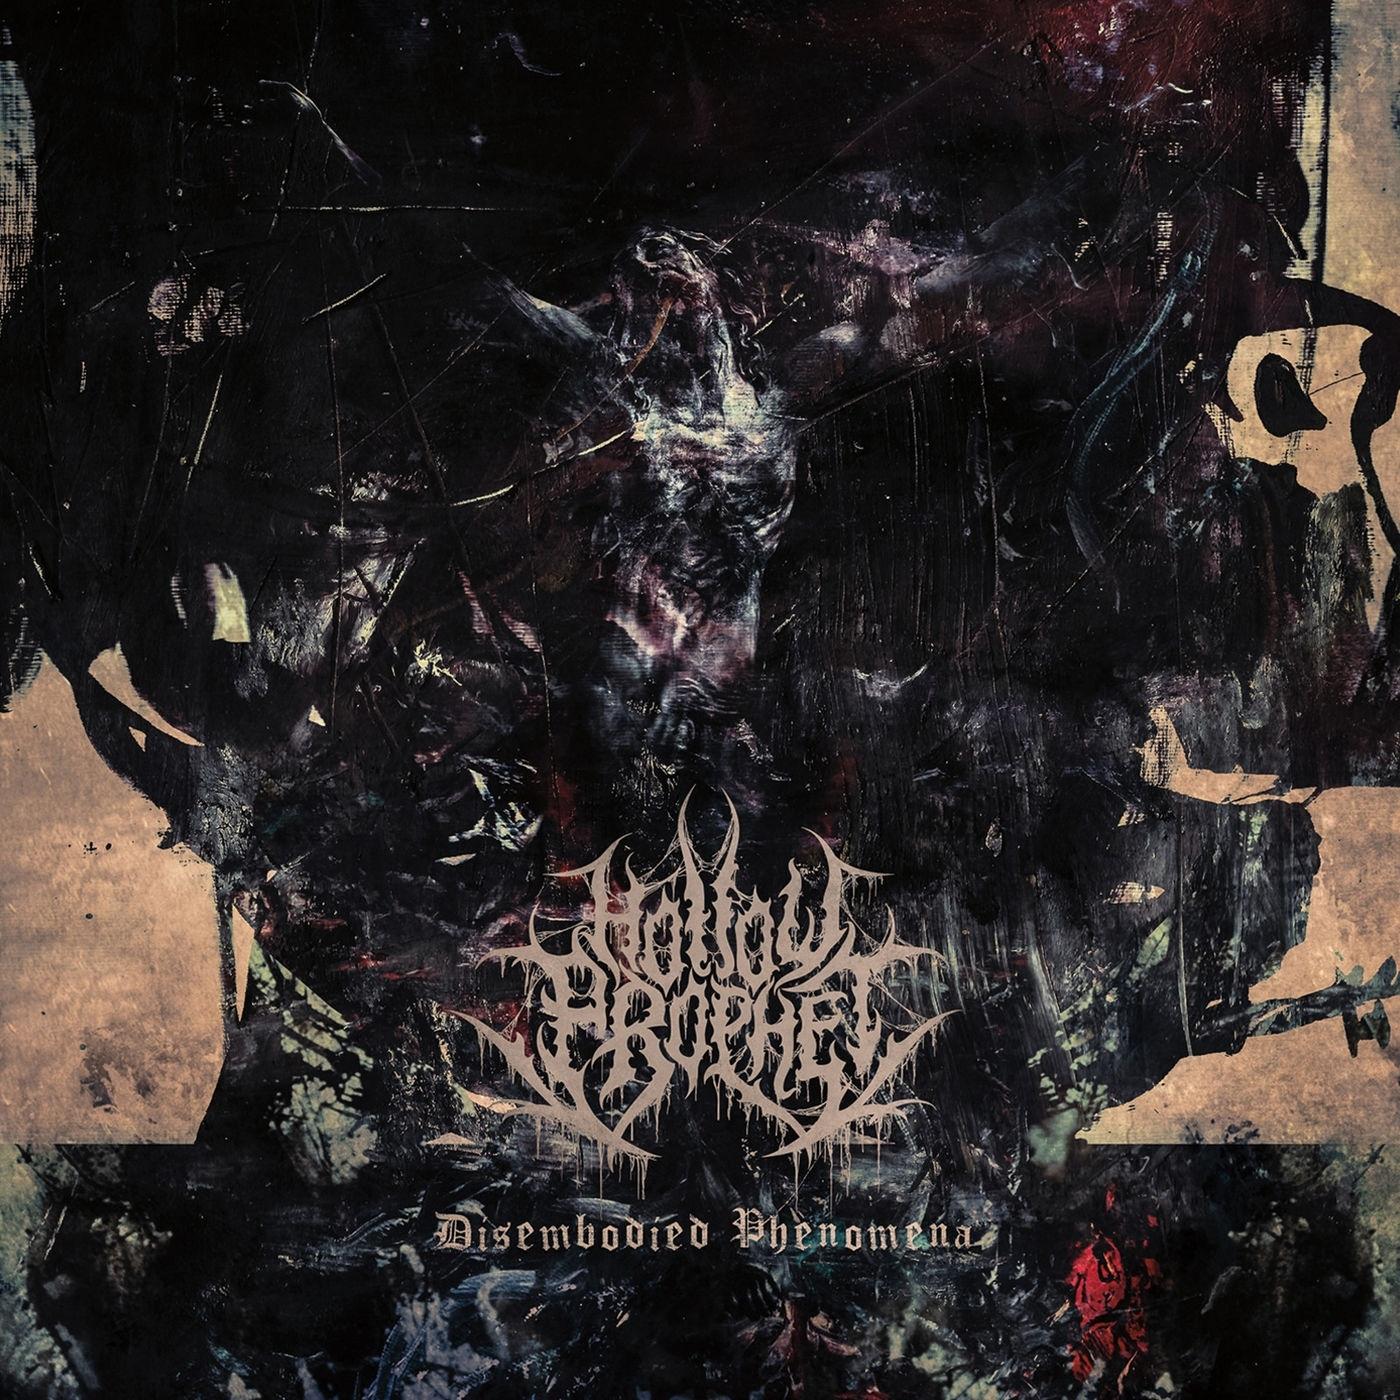 Hollow Prophet - Disembodied Phenomena [single] (2019)